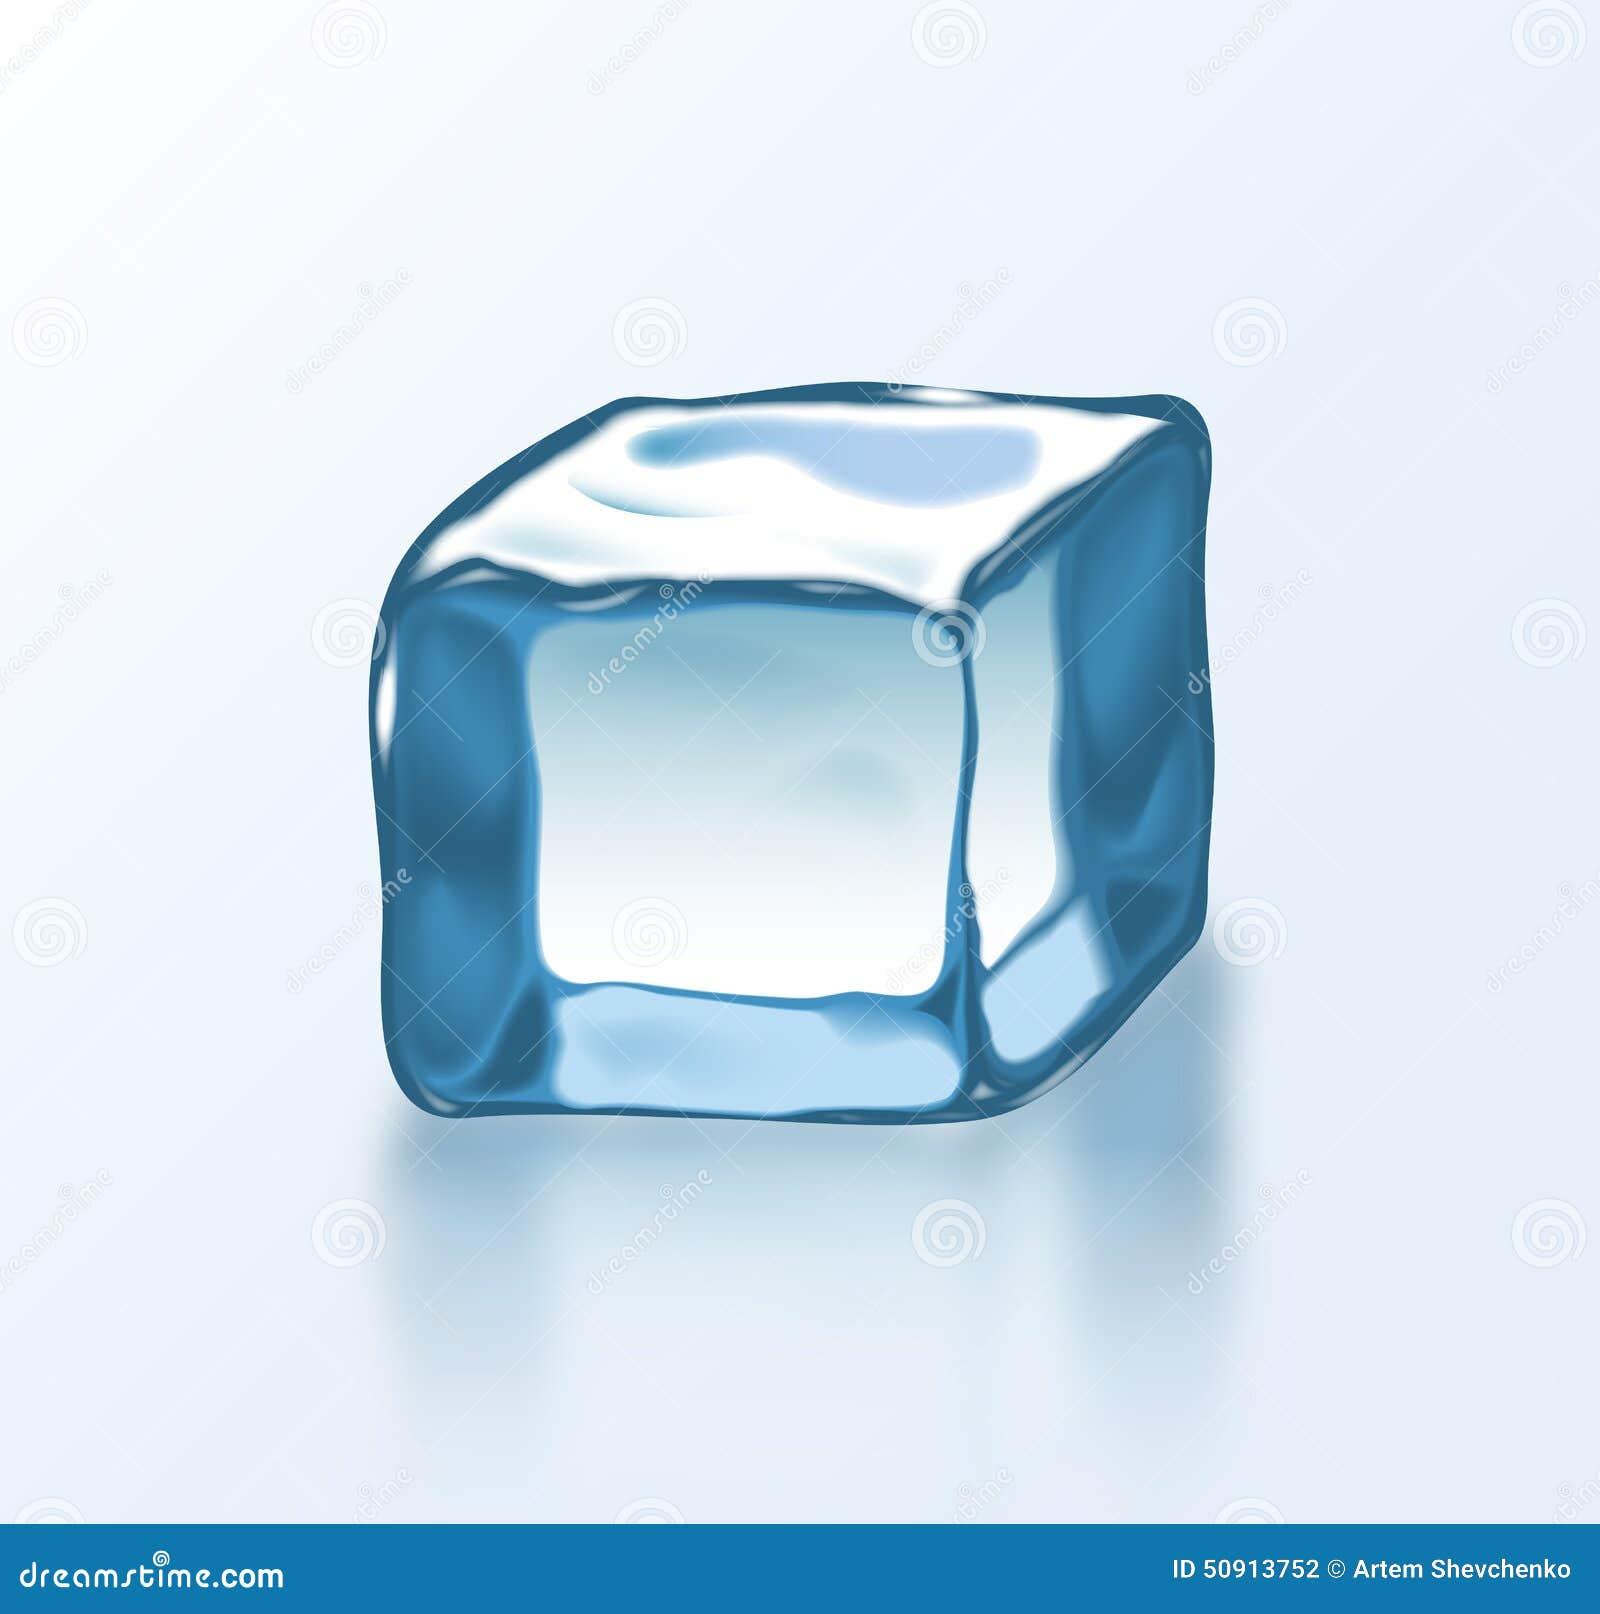 block clear ice stock illustrations 1 058 block clear ice stock illustrations vectors clipart dreamstime dreamstime com